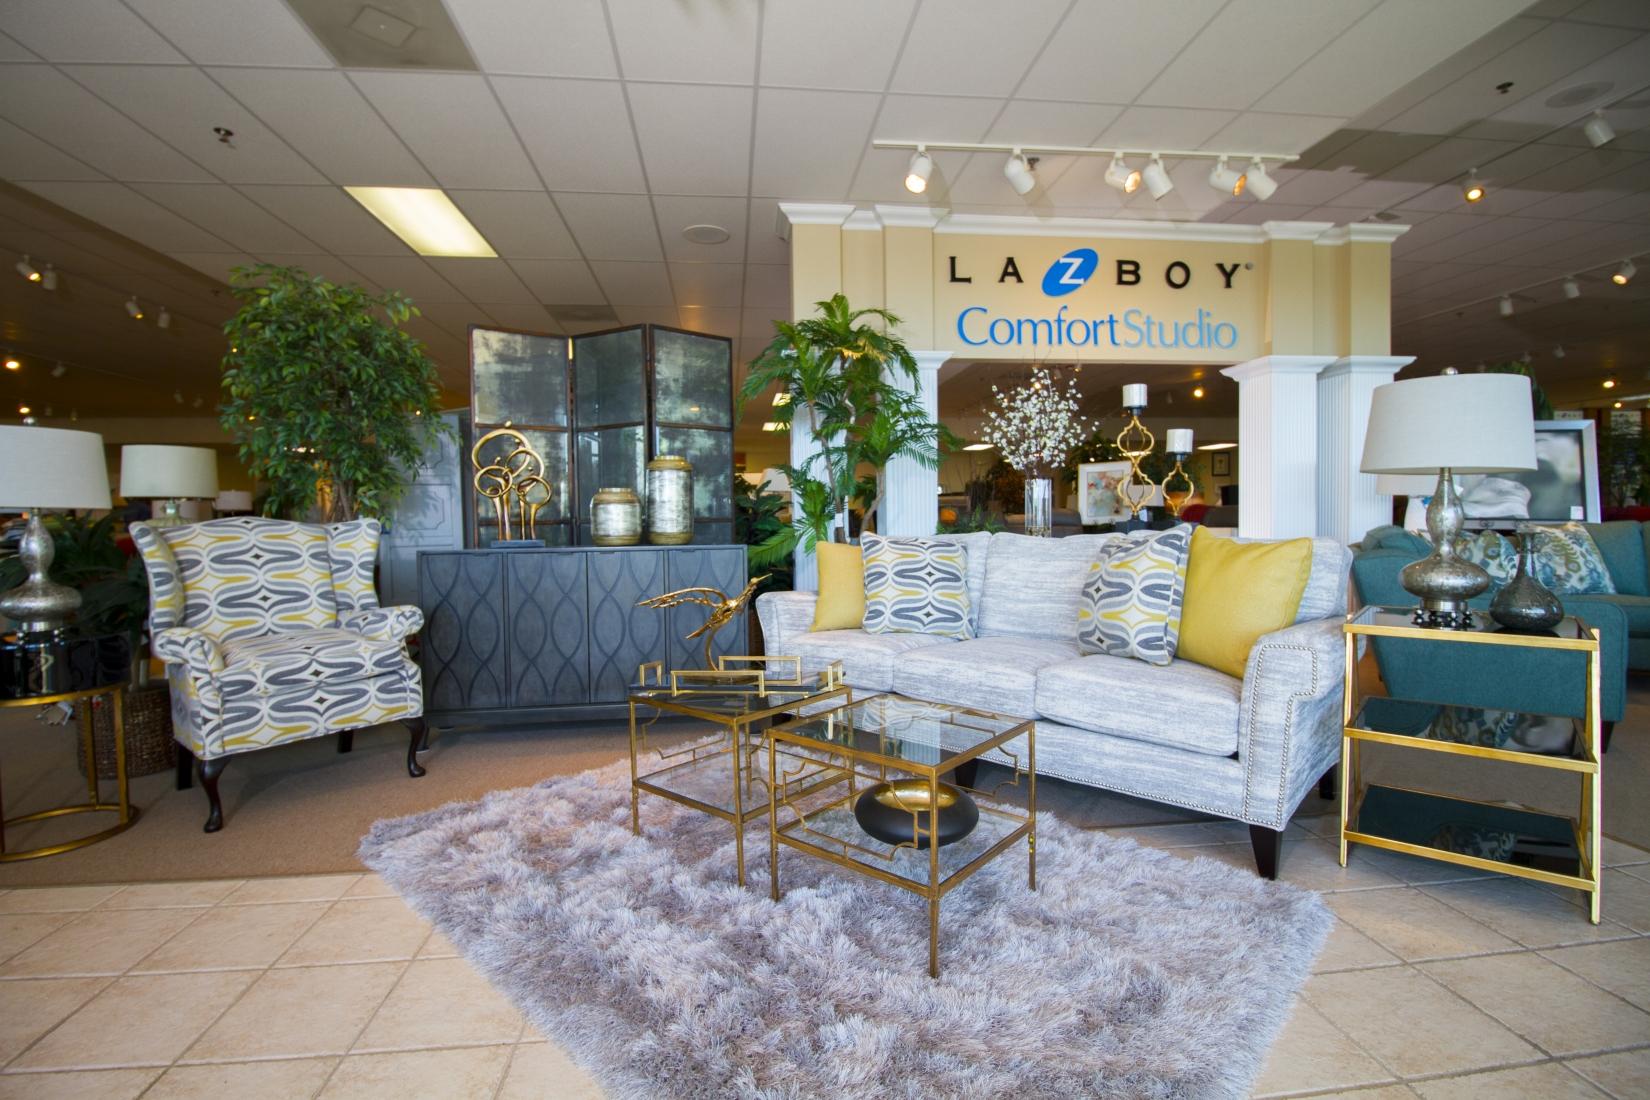 Nice Whiteu0027s Furniture U0026 Accessories | 13970 South US Highway 441 | Summerfield,  FL 34491 | 352.245.8400